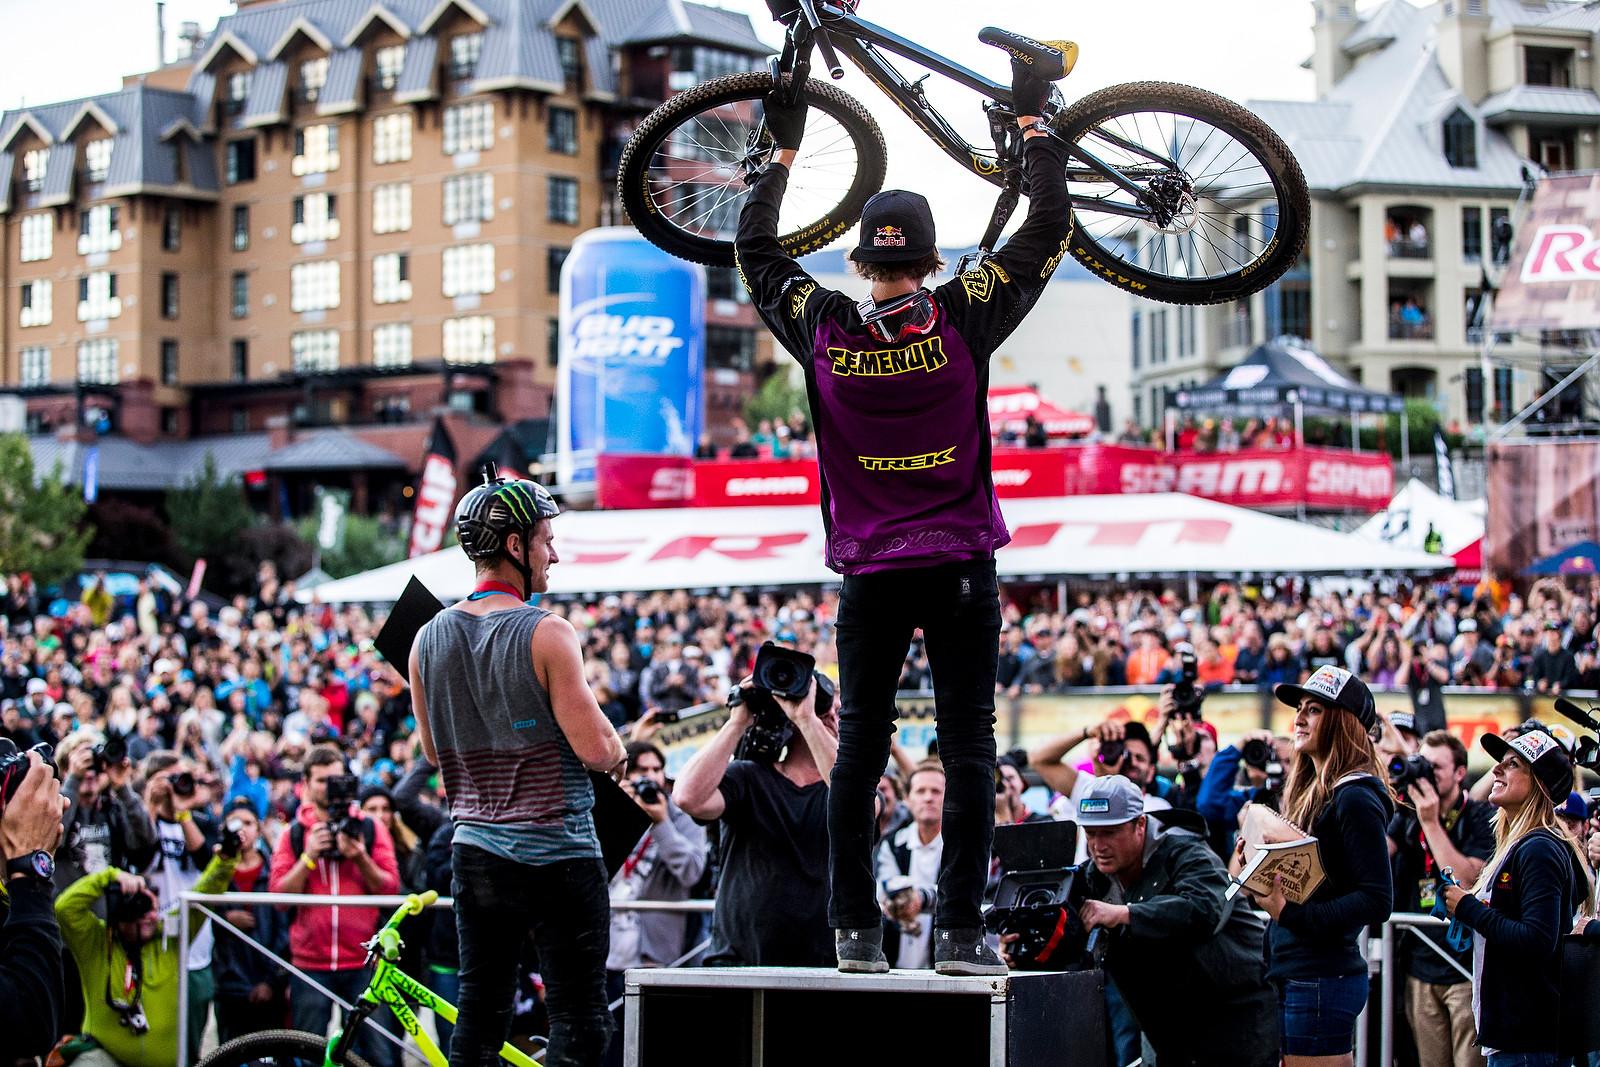 Brandon Semenuk on the Box - Winning Bike: Brandon Semenuk's Trek Ticket S - Mountain Biking Pictures - Vital MTB